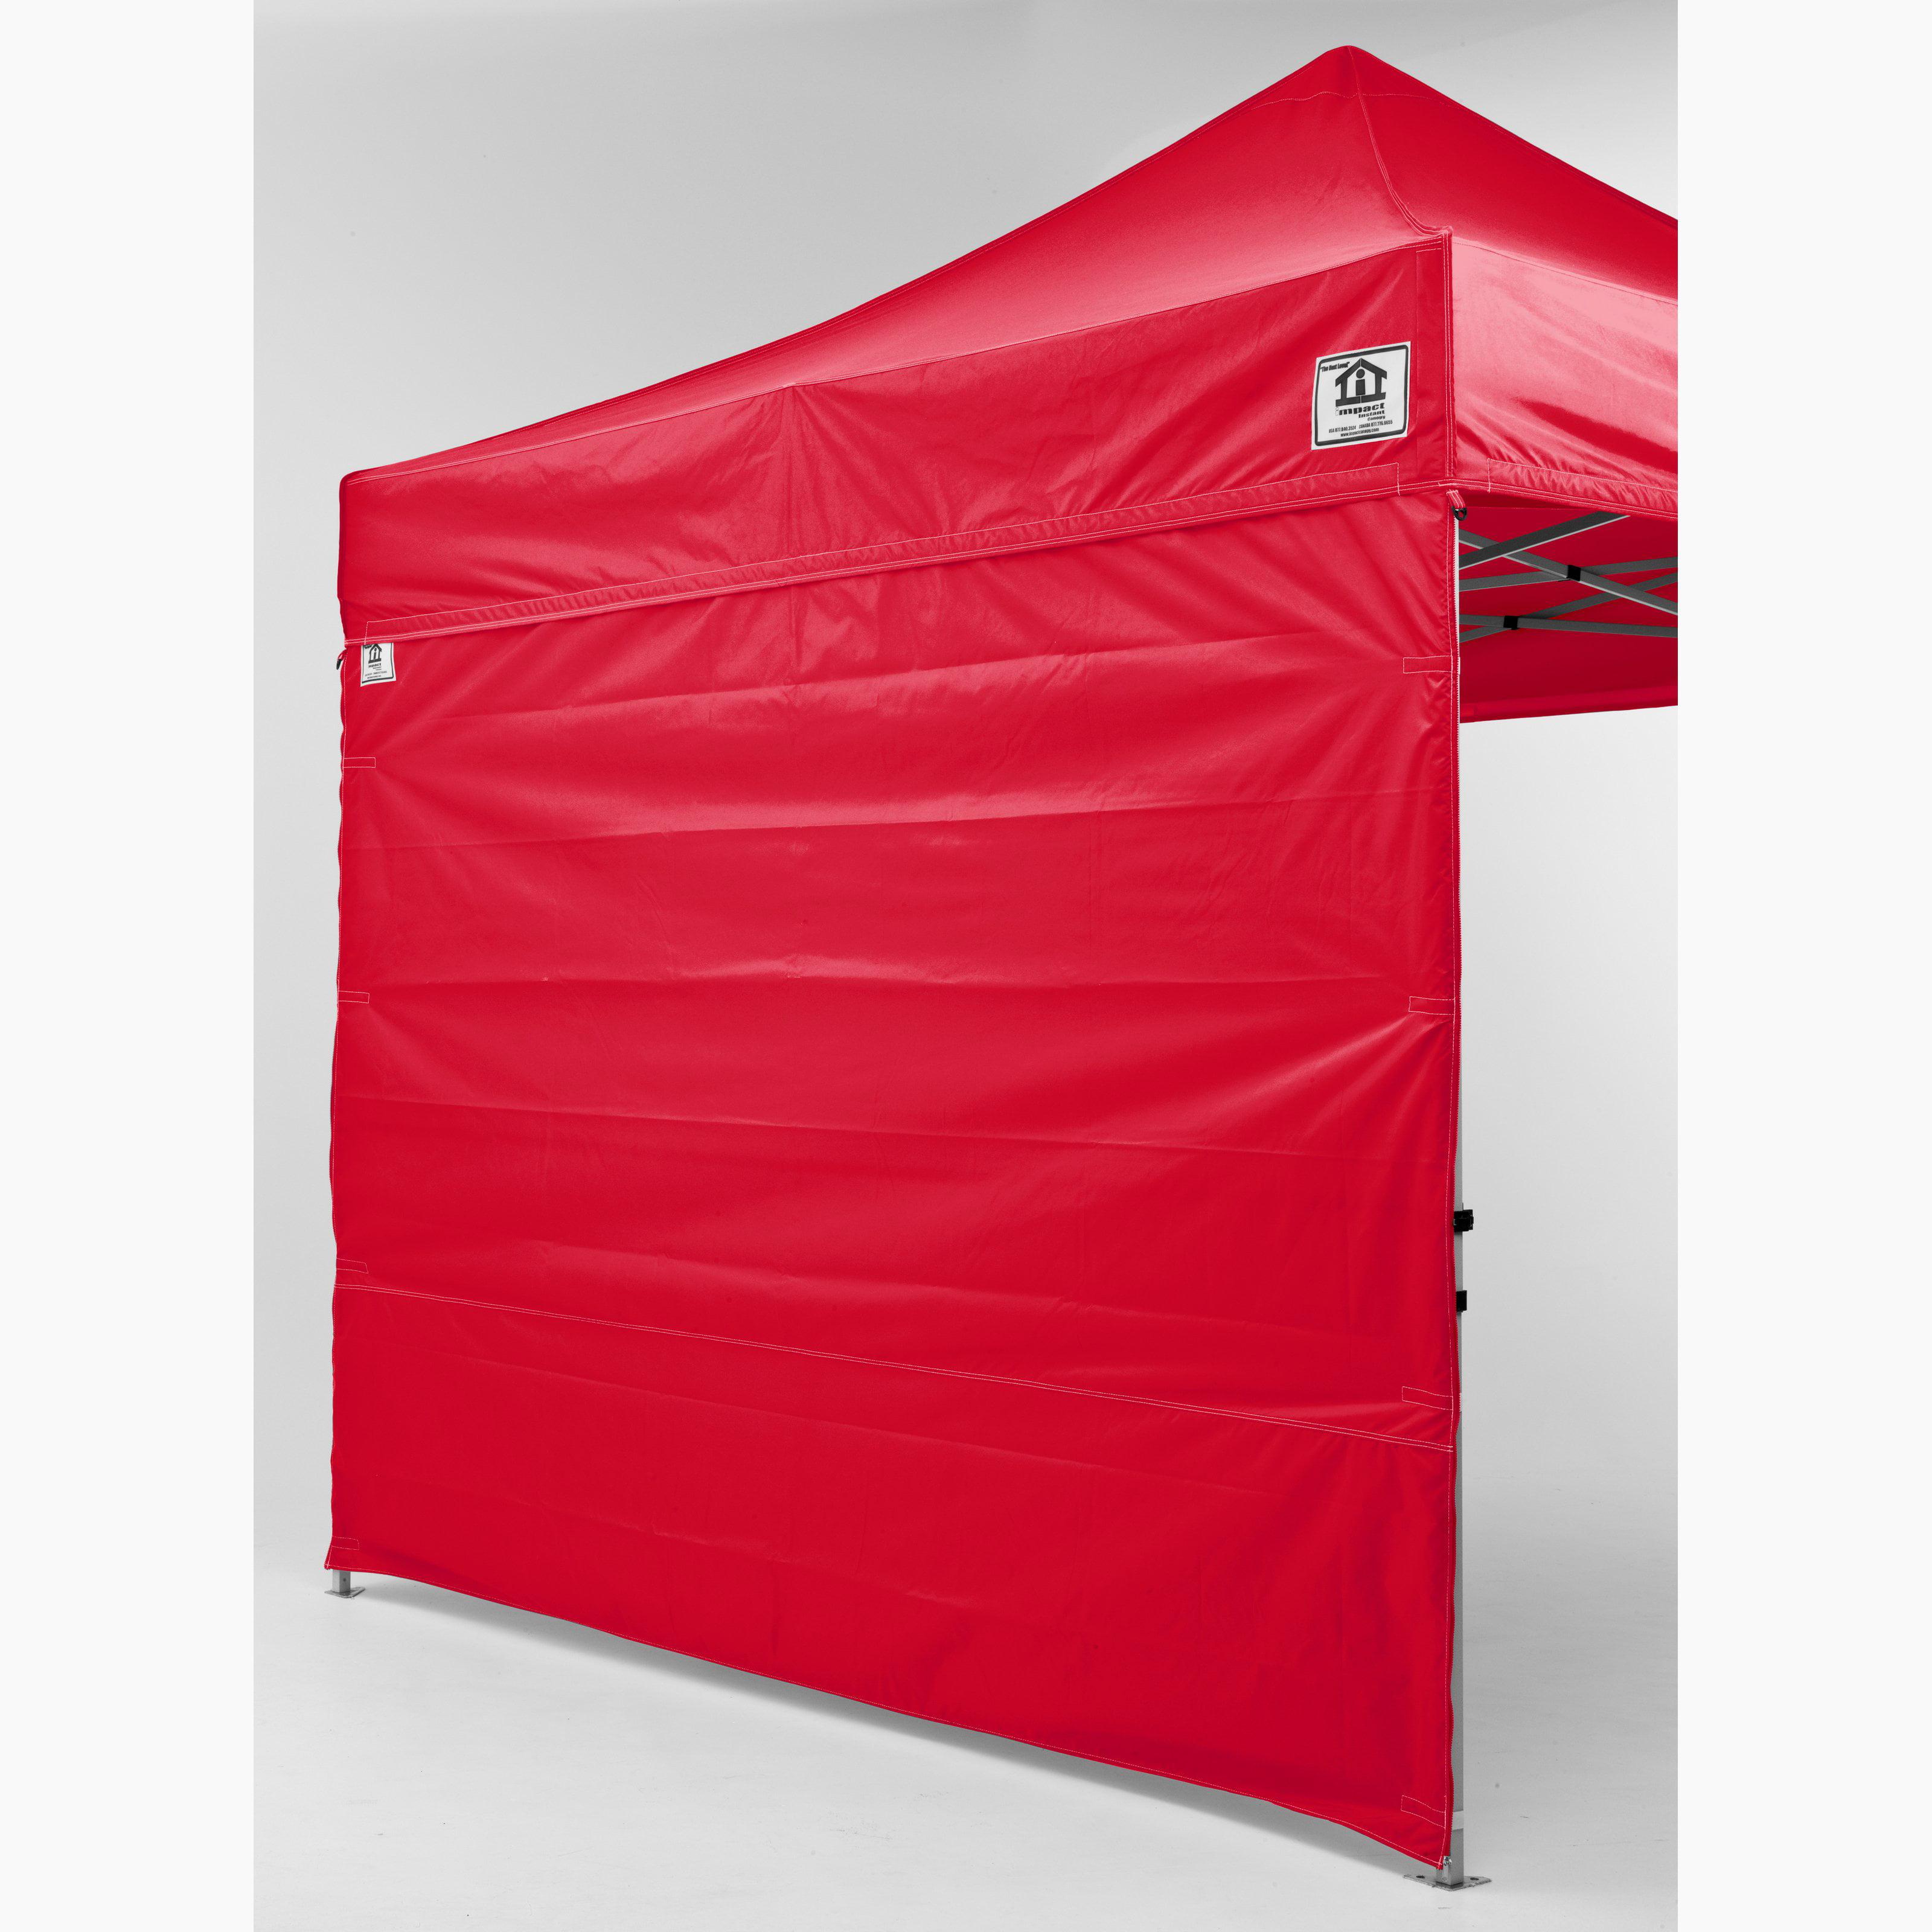 Impact Canopy 10x10 ft. Pop Up Canopy Tent Straight Leg Canopy Sidewalls - Set of 2 - Walmart.com  sc 1 st  Walmart & Impact Canopy 10x10 ft. Pop Up Canopy Tent Straight Leg Canopy ...